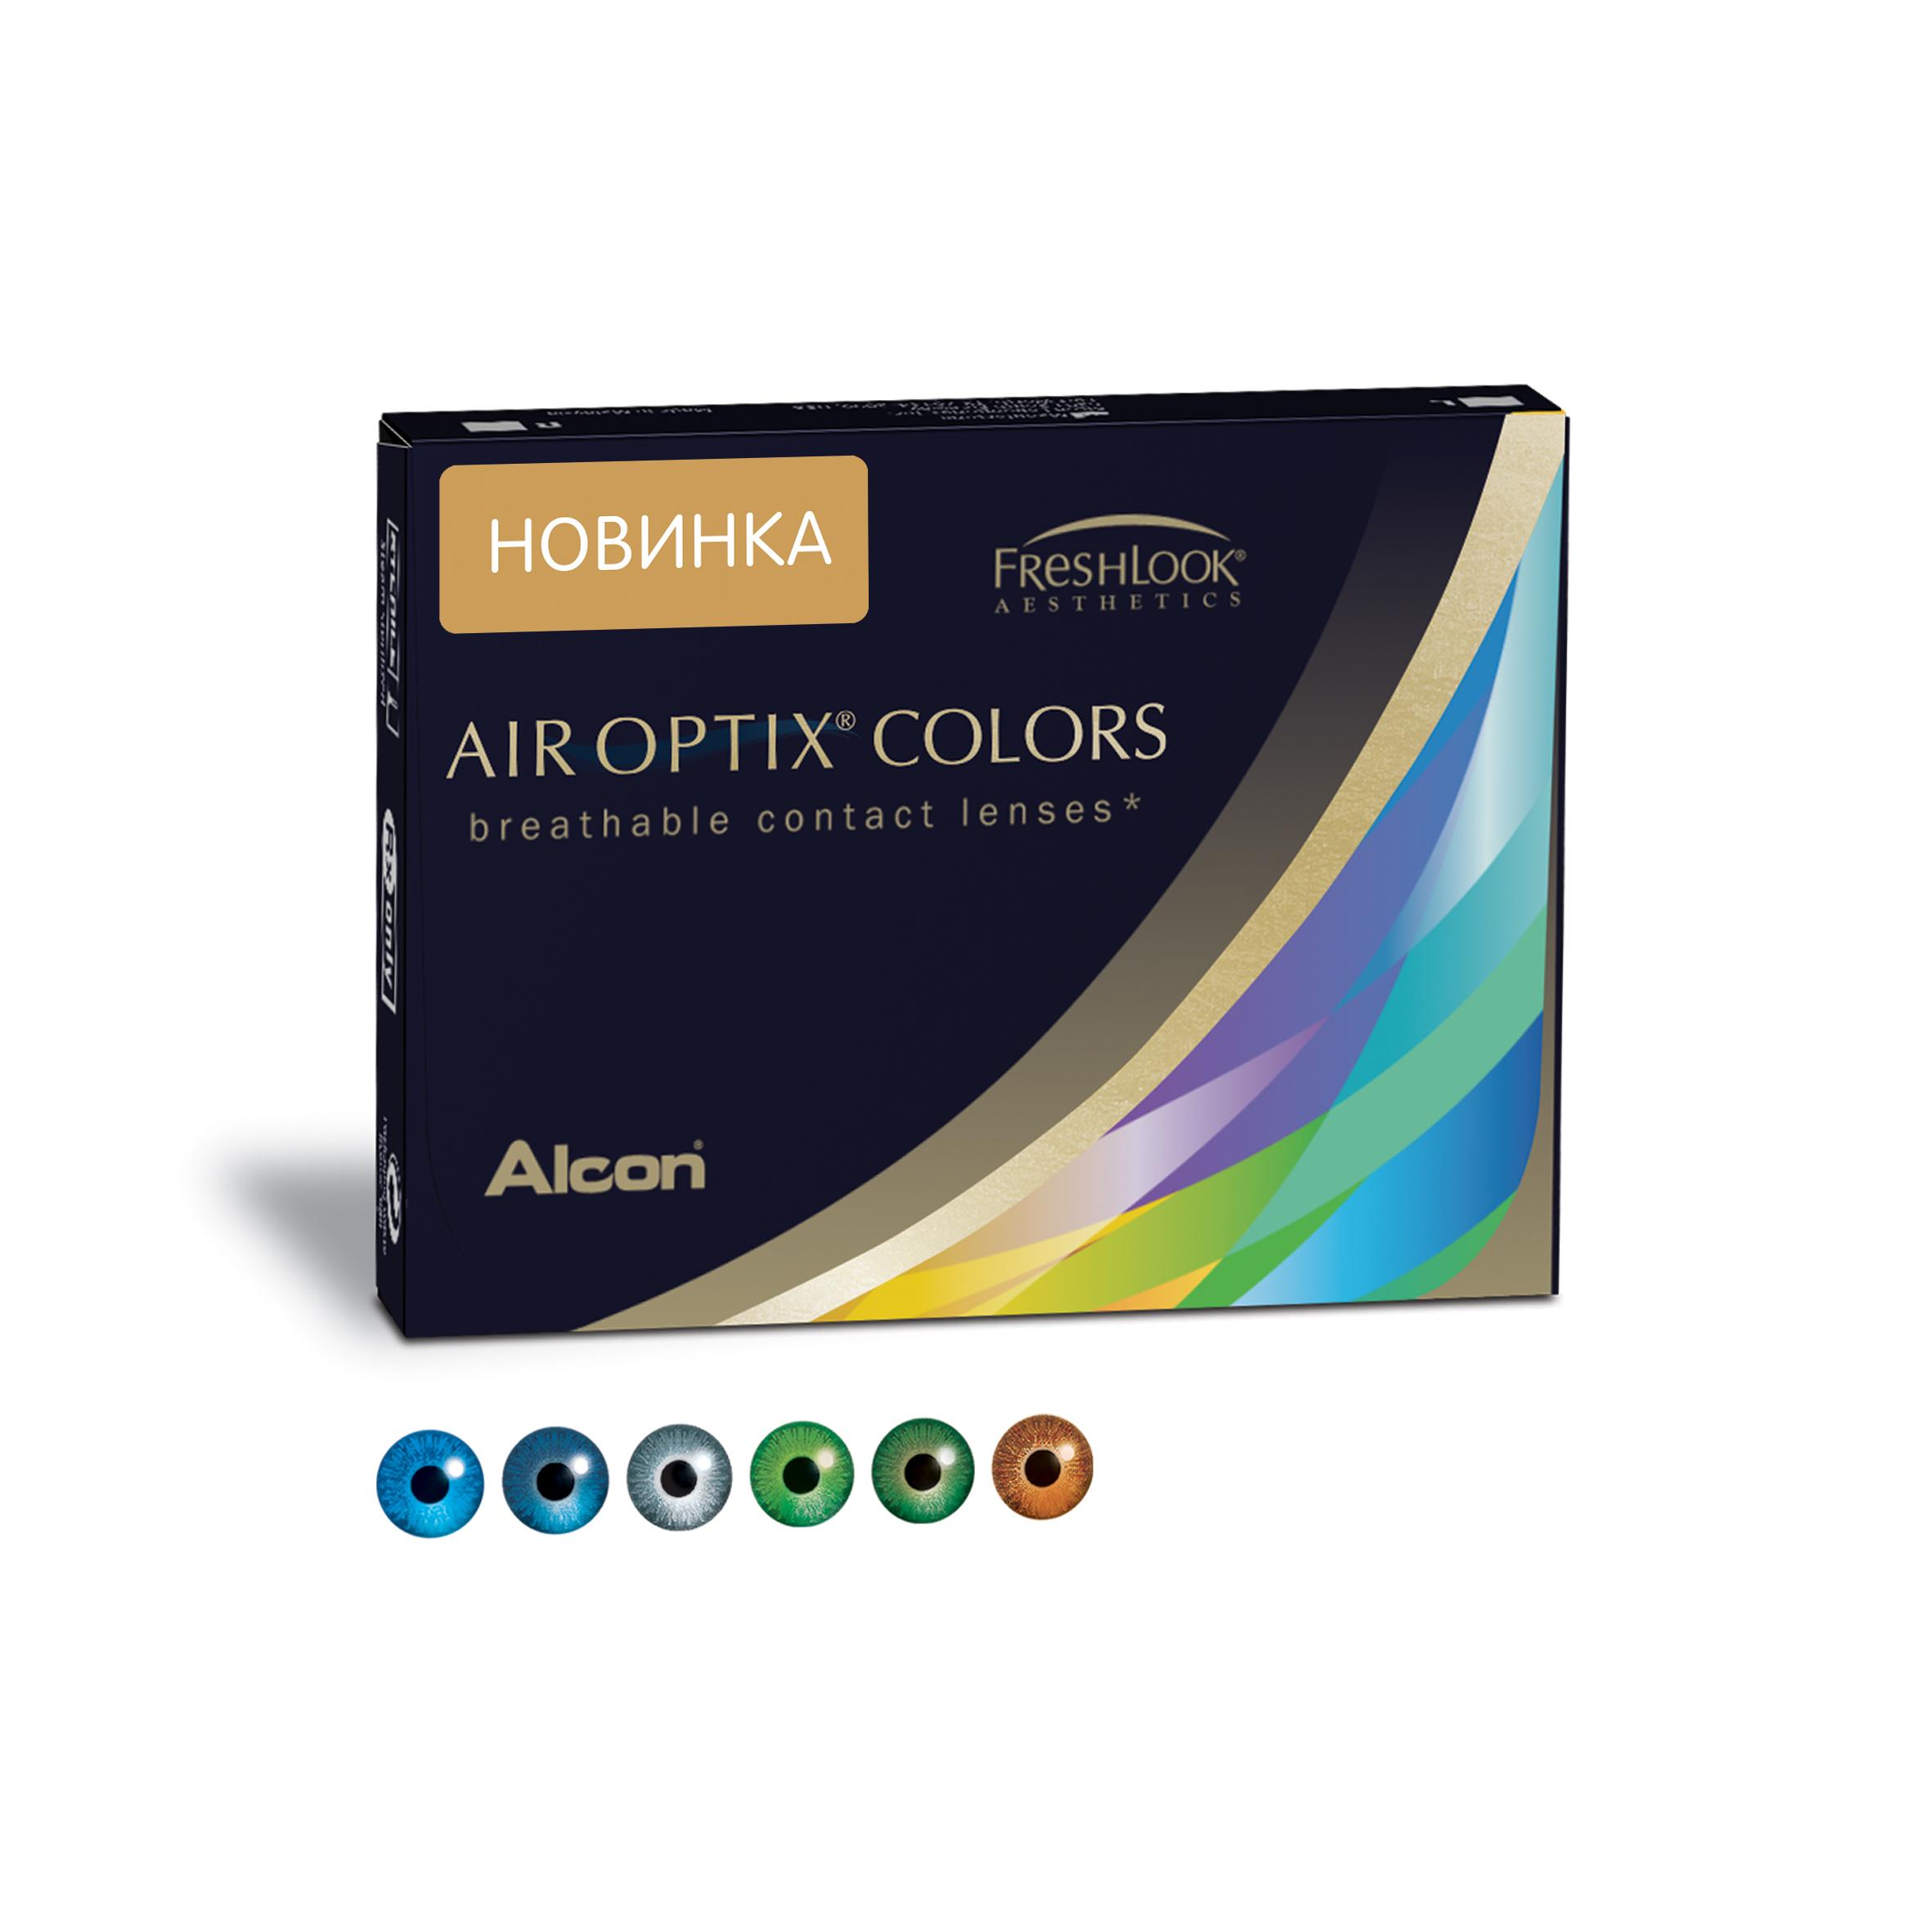 Аlcon контактные линзы Air Optix Colors 2 шт -7.00 Green31746324Мягкие контактные линзы